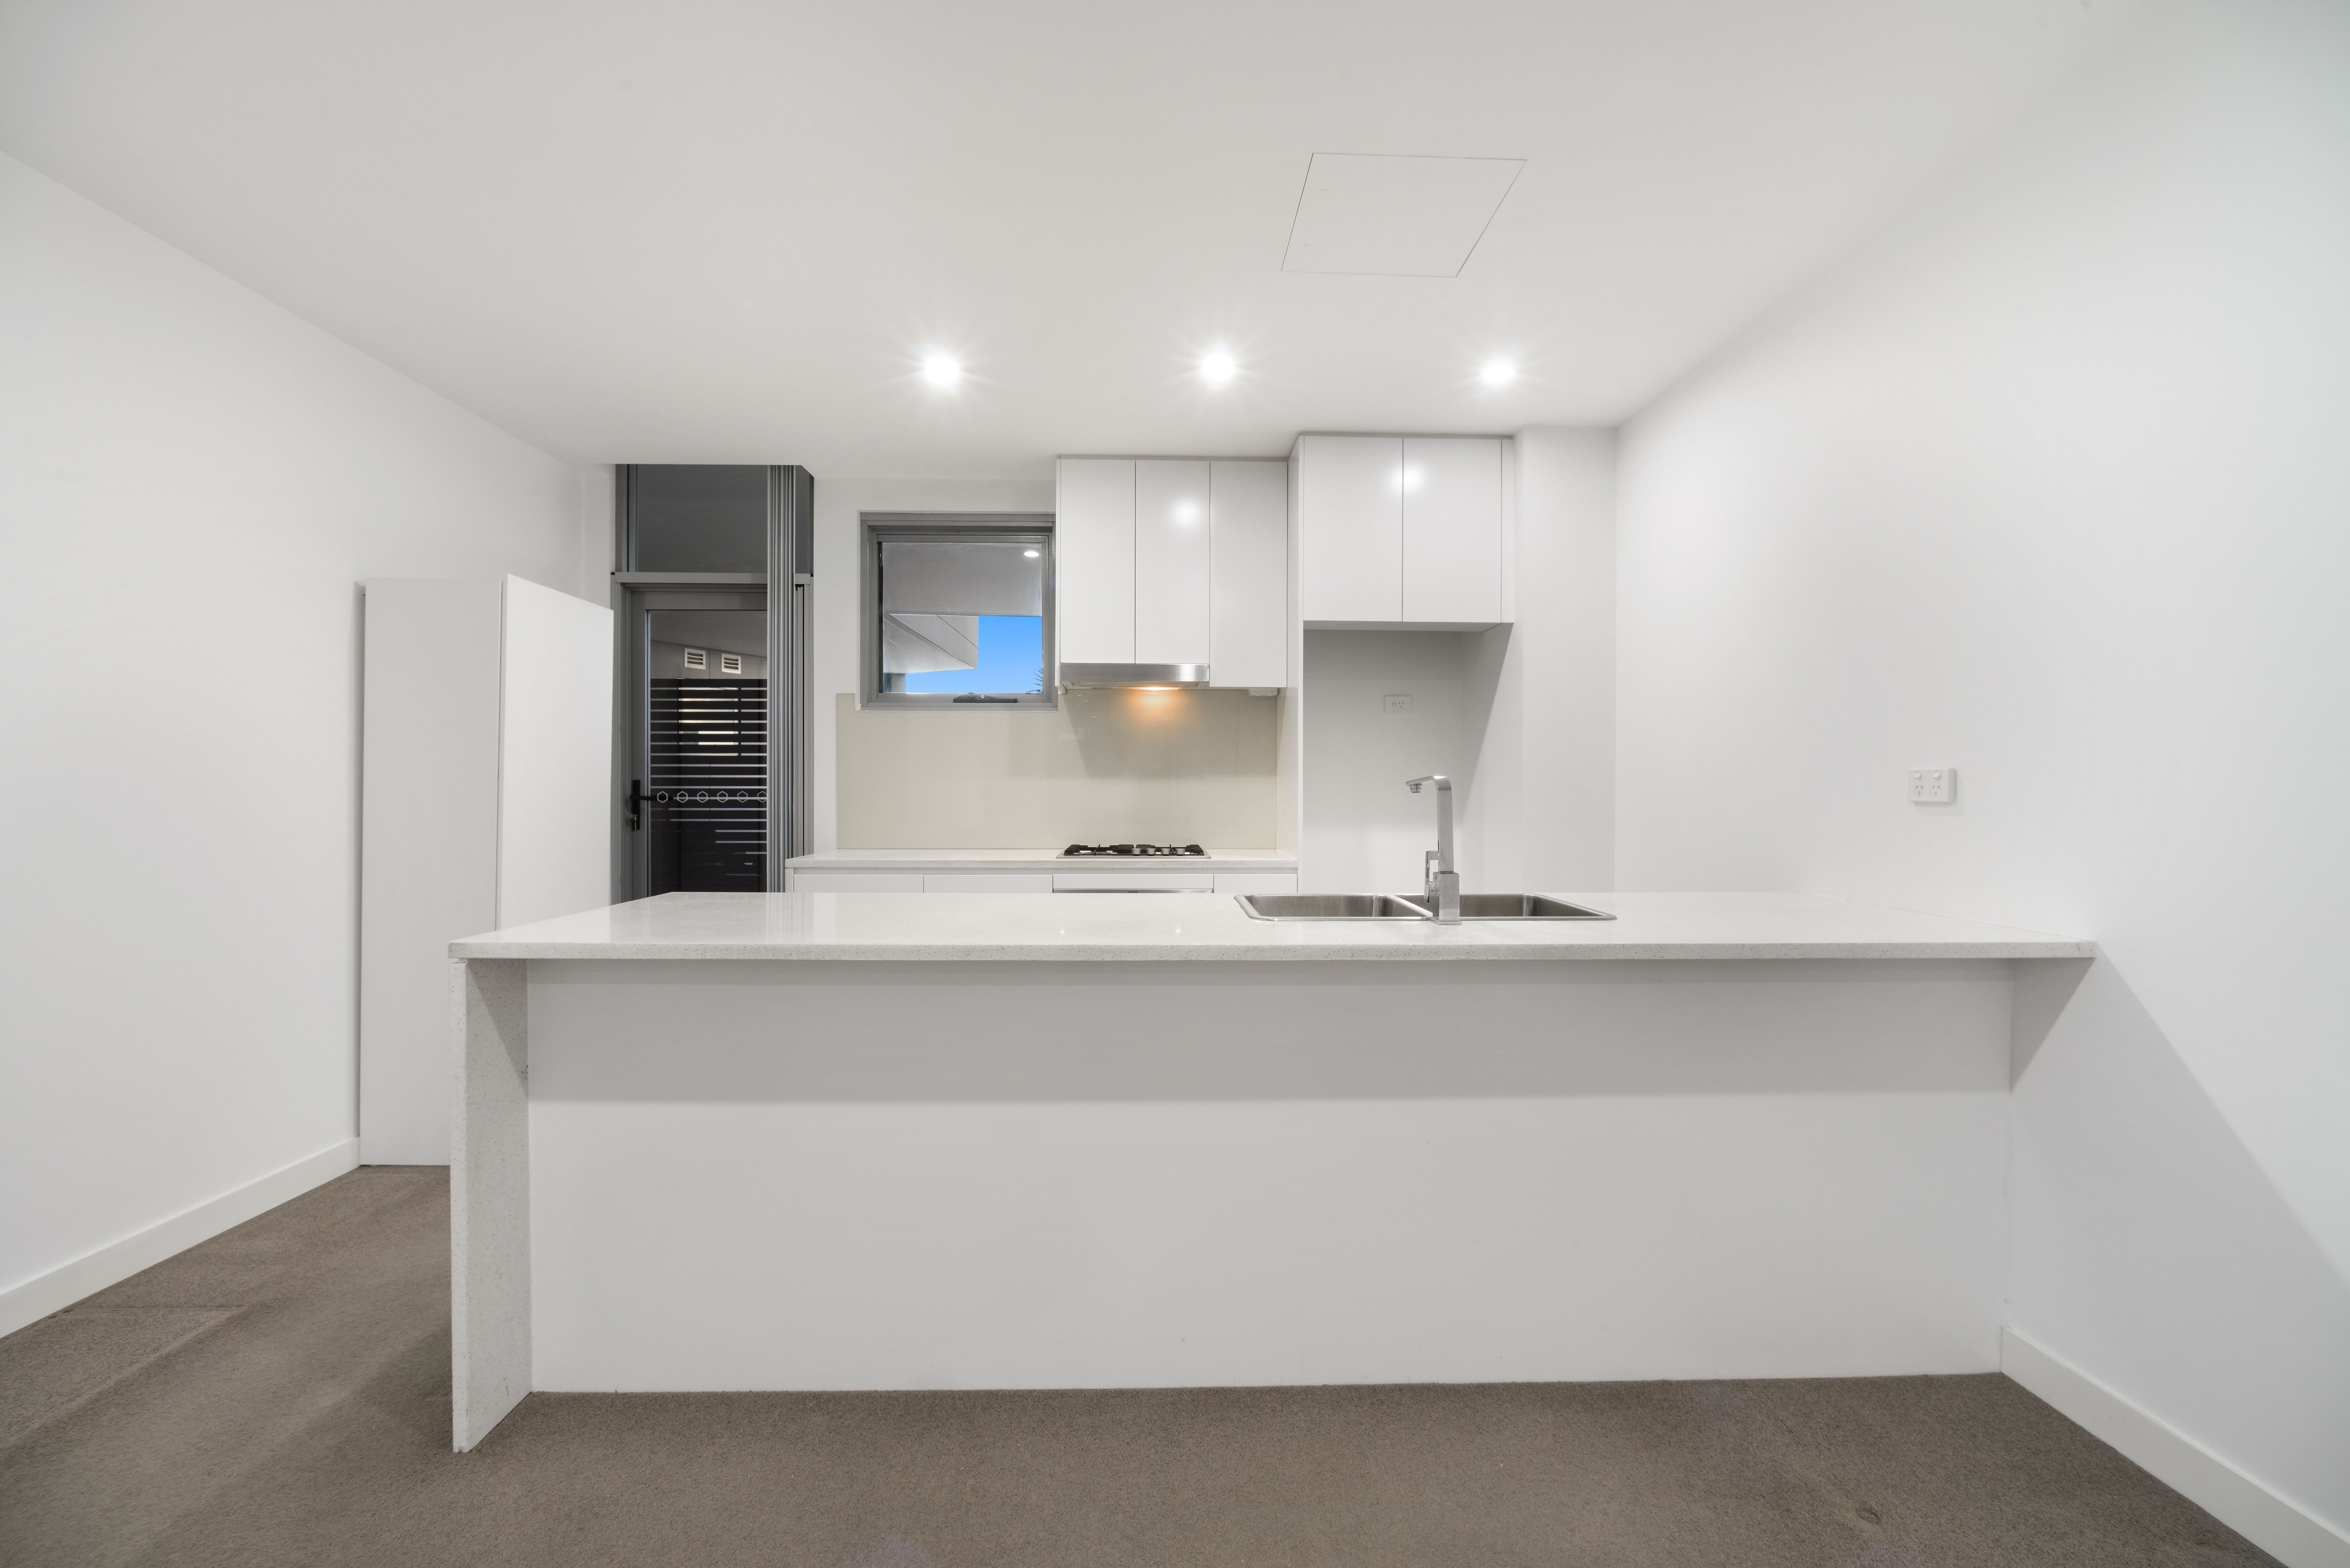 56/235 Homebush Road, Strathfield NSW 2135